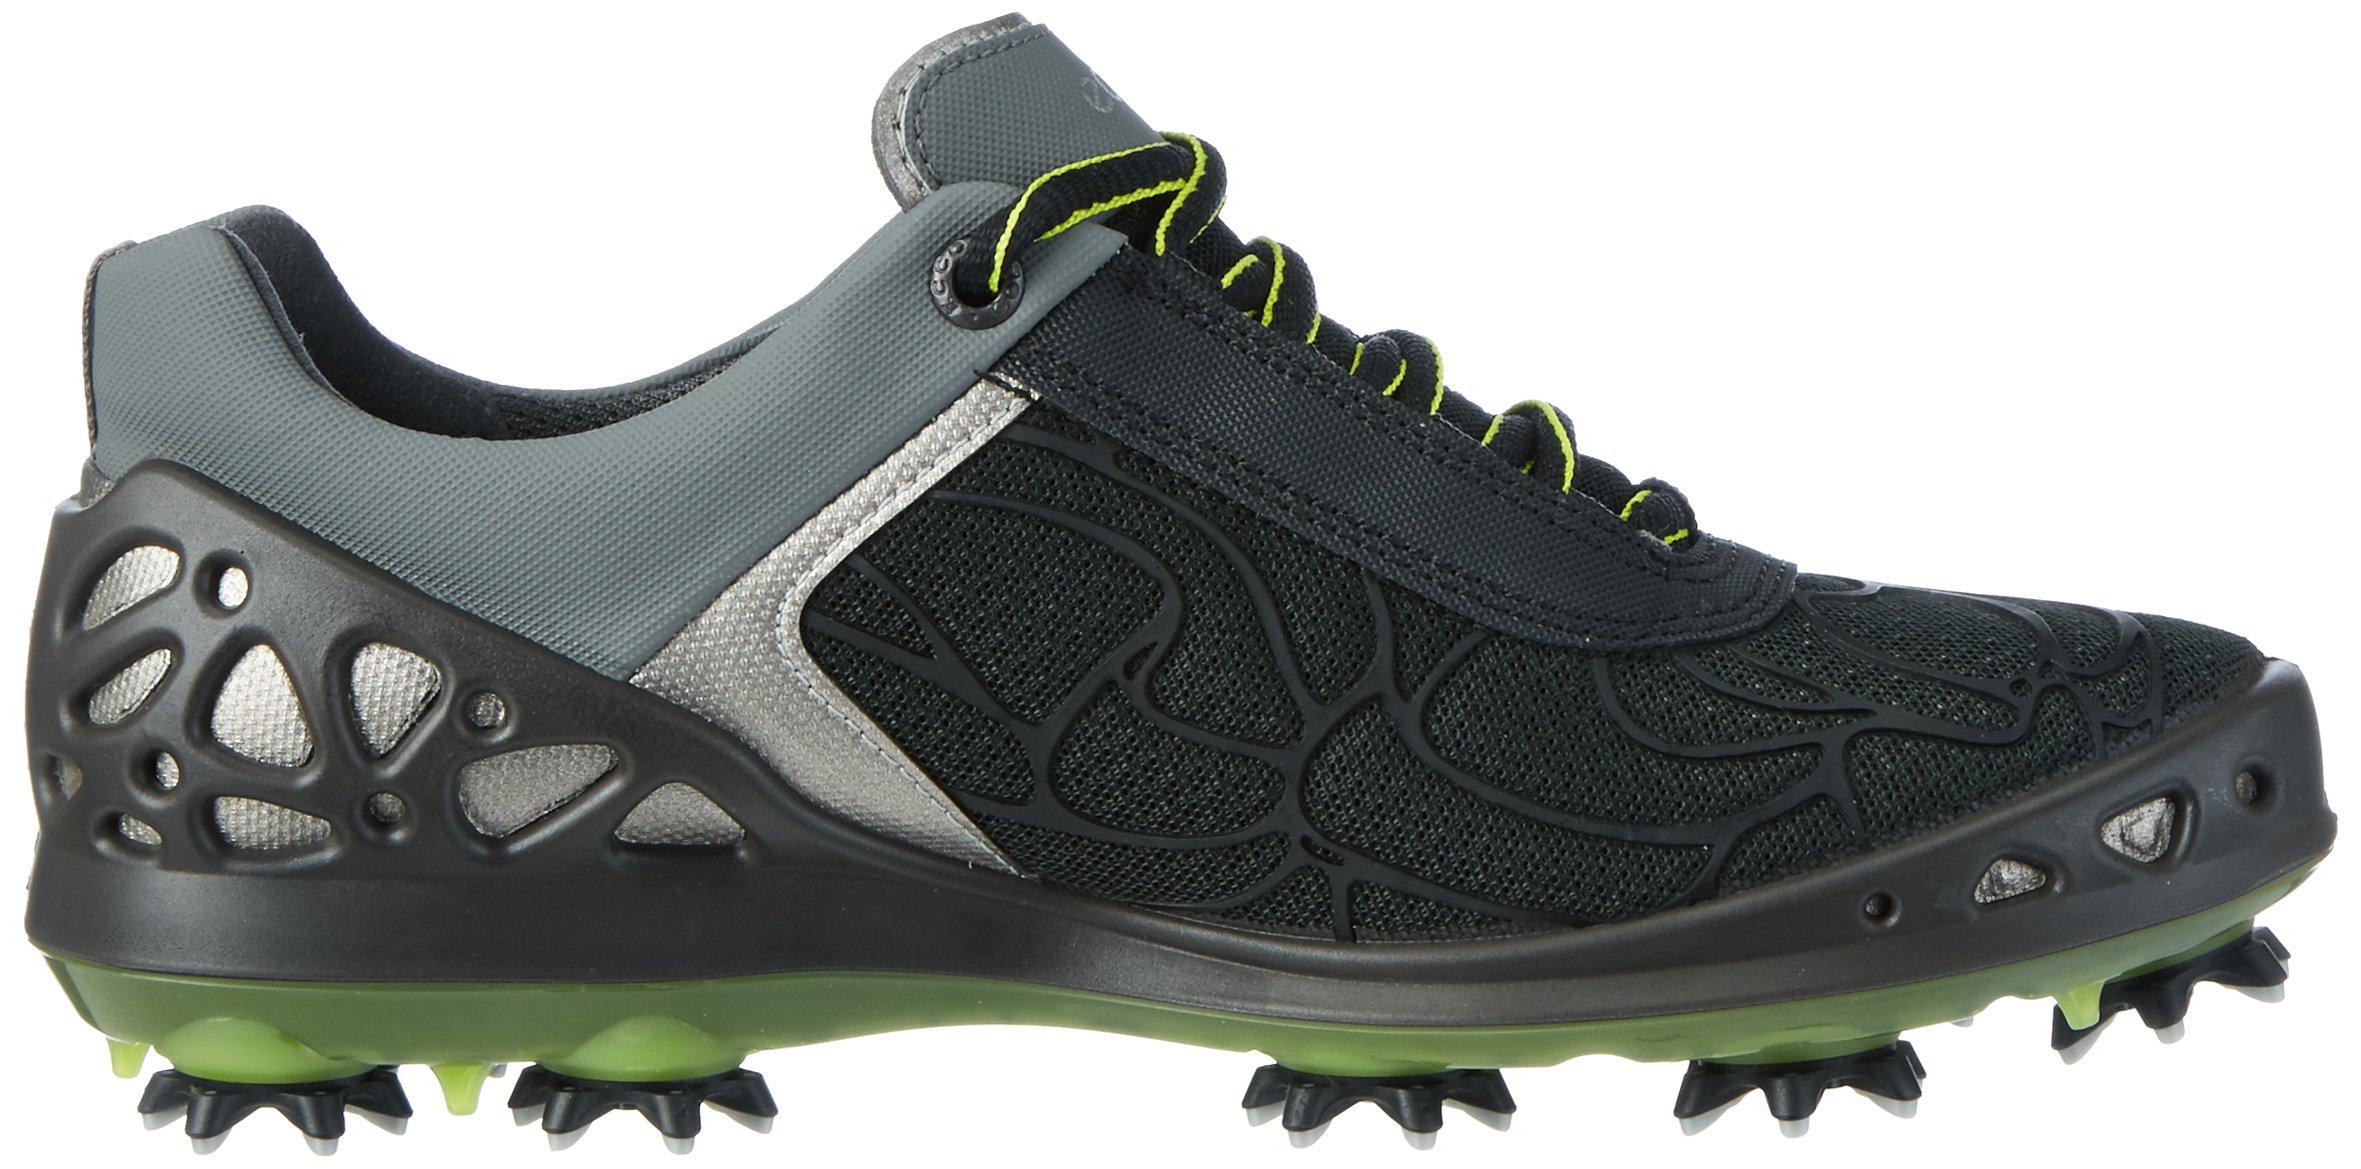 ECCO Women's Cage Evo Golf Shoe, Black, 41 EU/10-10.5 M US by ECCO (Image #6)